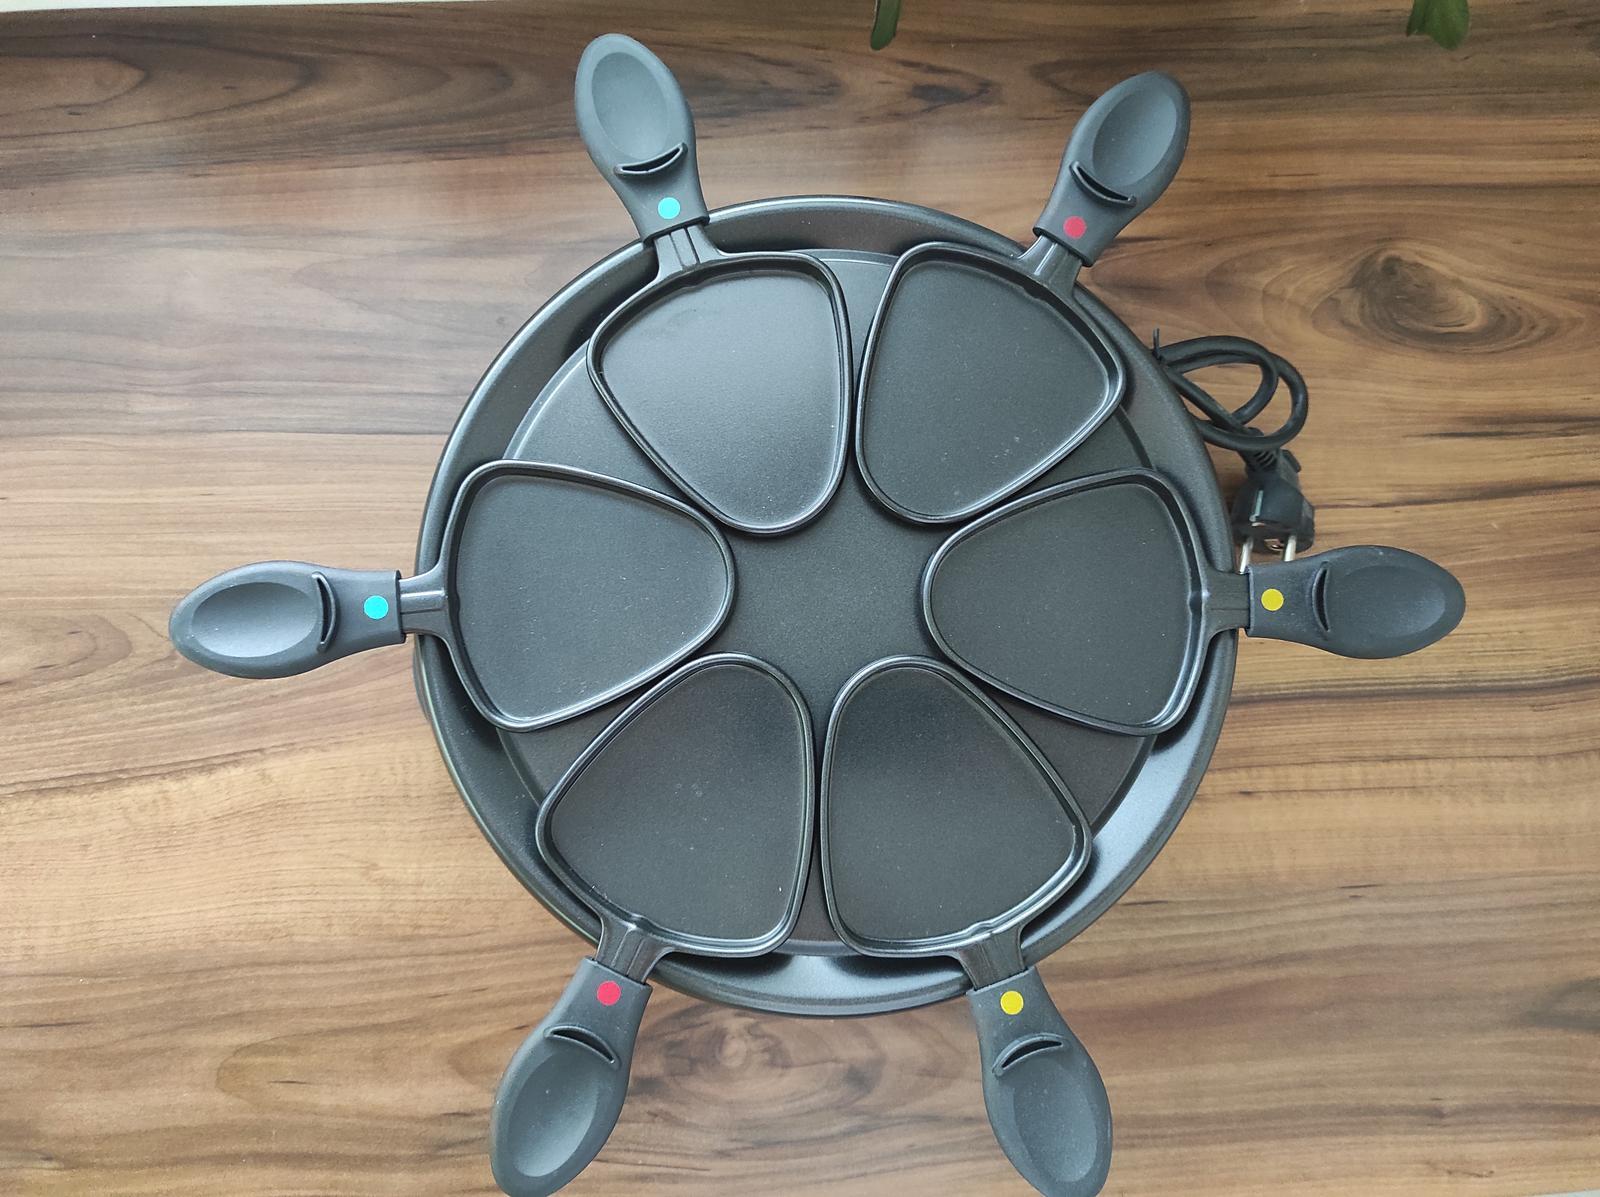 Elektricky raclette gril - Obrázok č. 2